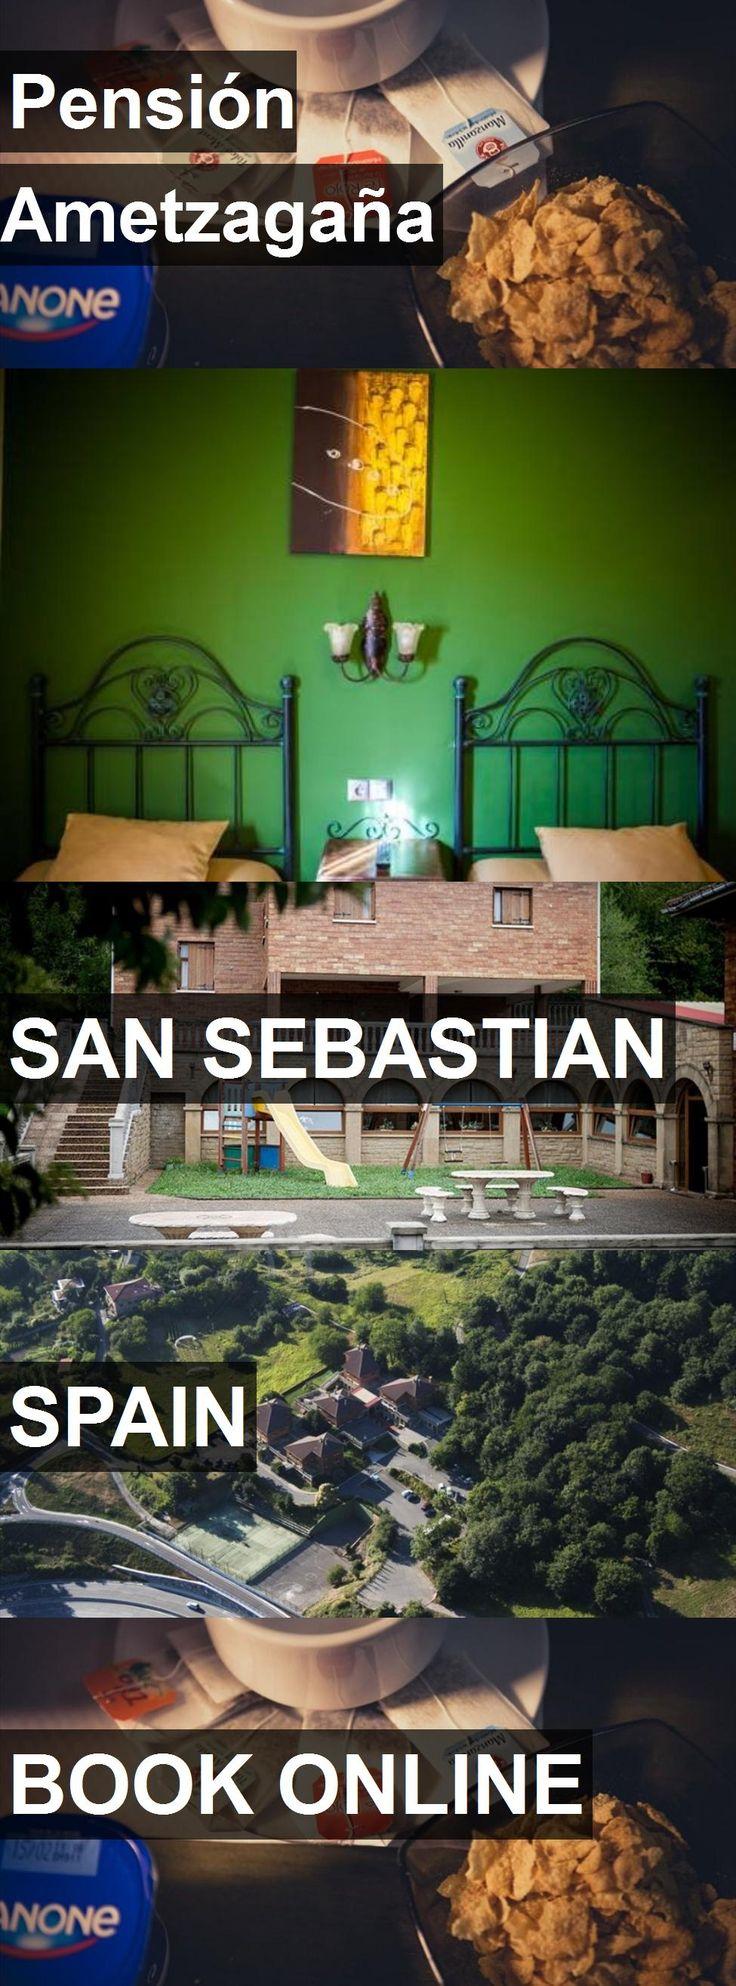 Hotel Pensión Ametzagaña in San Sebastian, Spain. For more information, photos, reviews and best prices please follow the link. #Spain #SanSebastian #travel #vacation #hotel